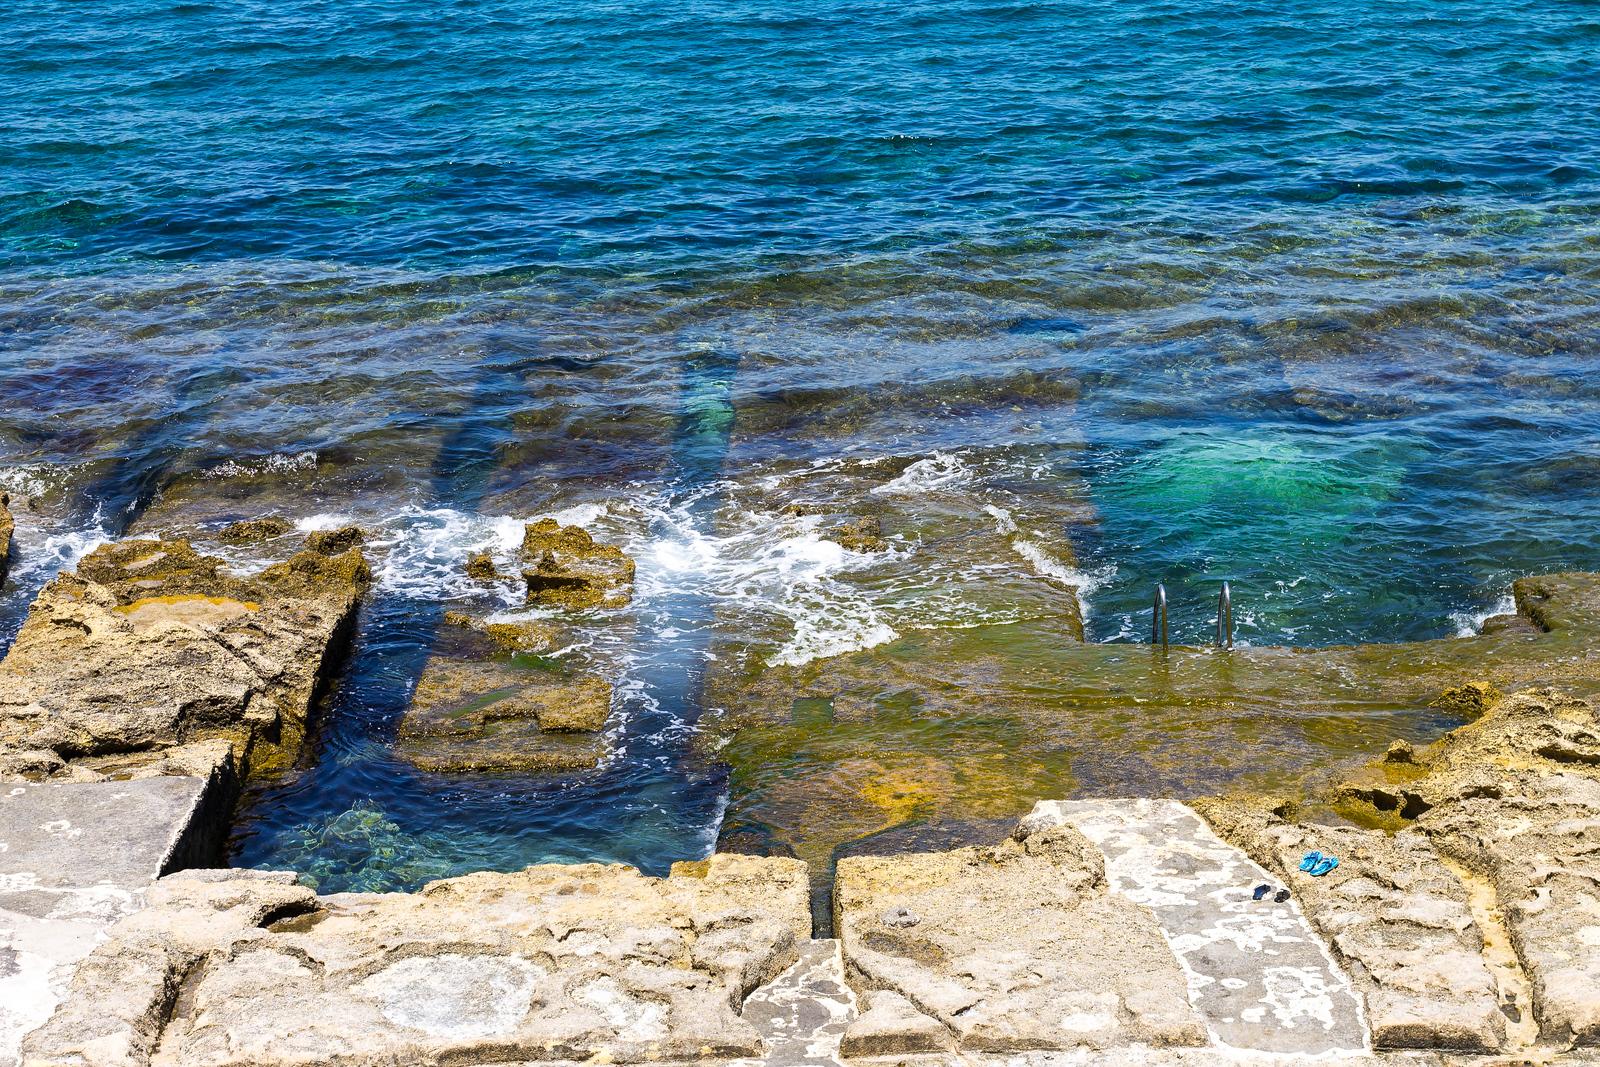 Malta Pictures - Sliema Pools